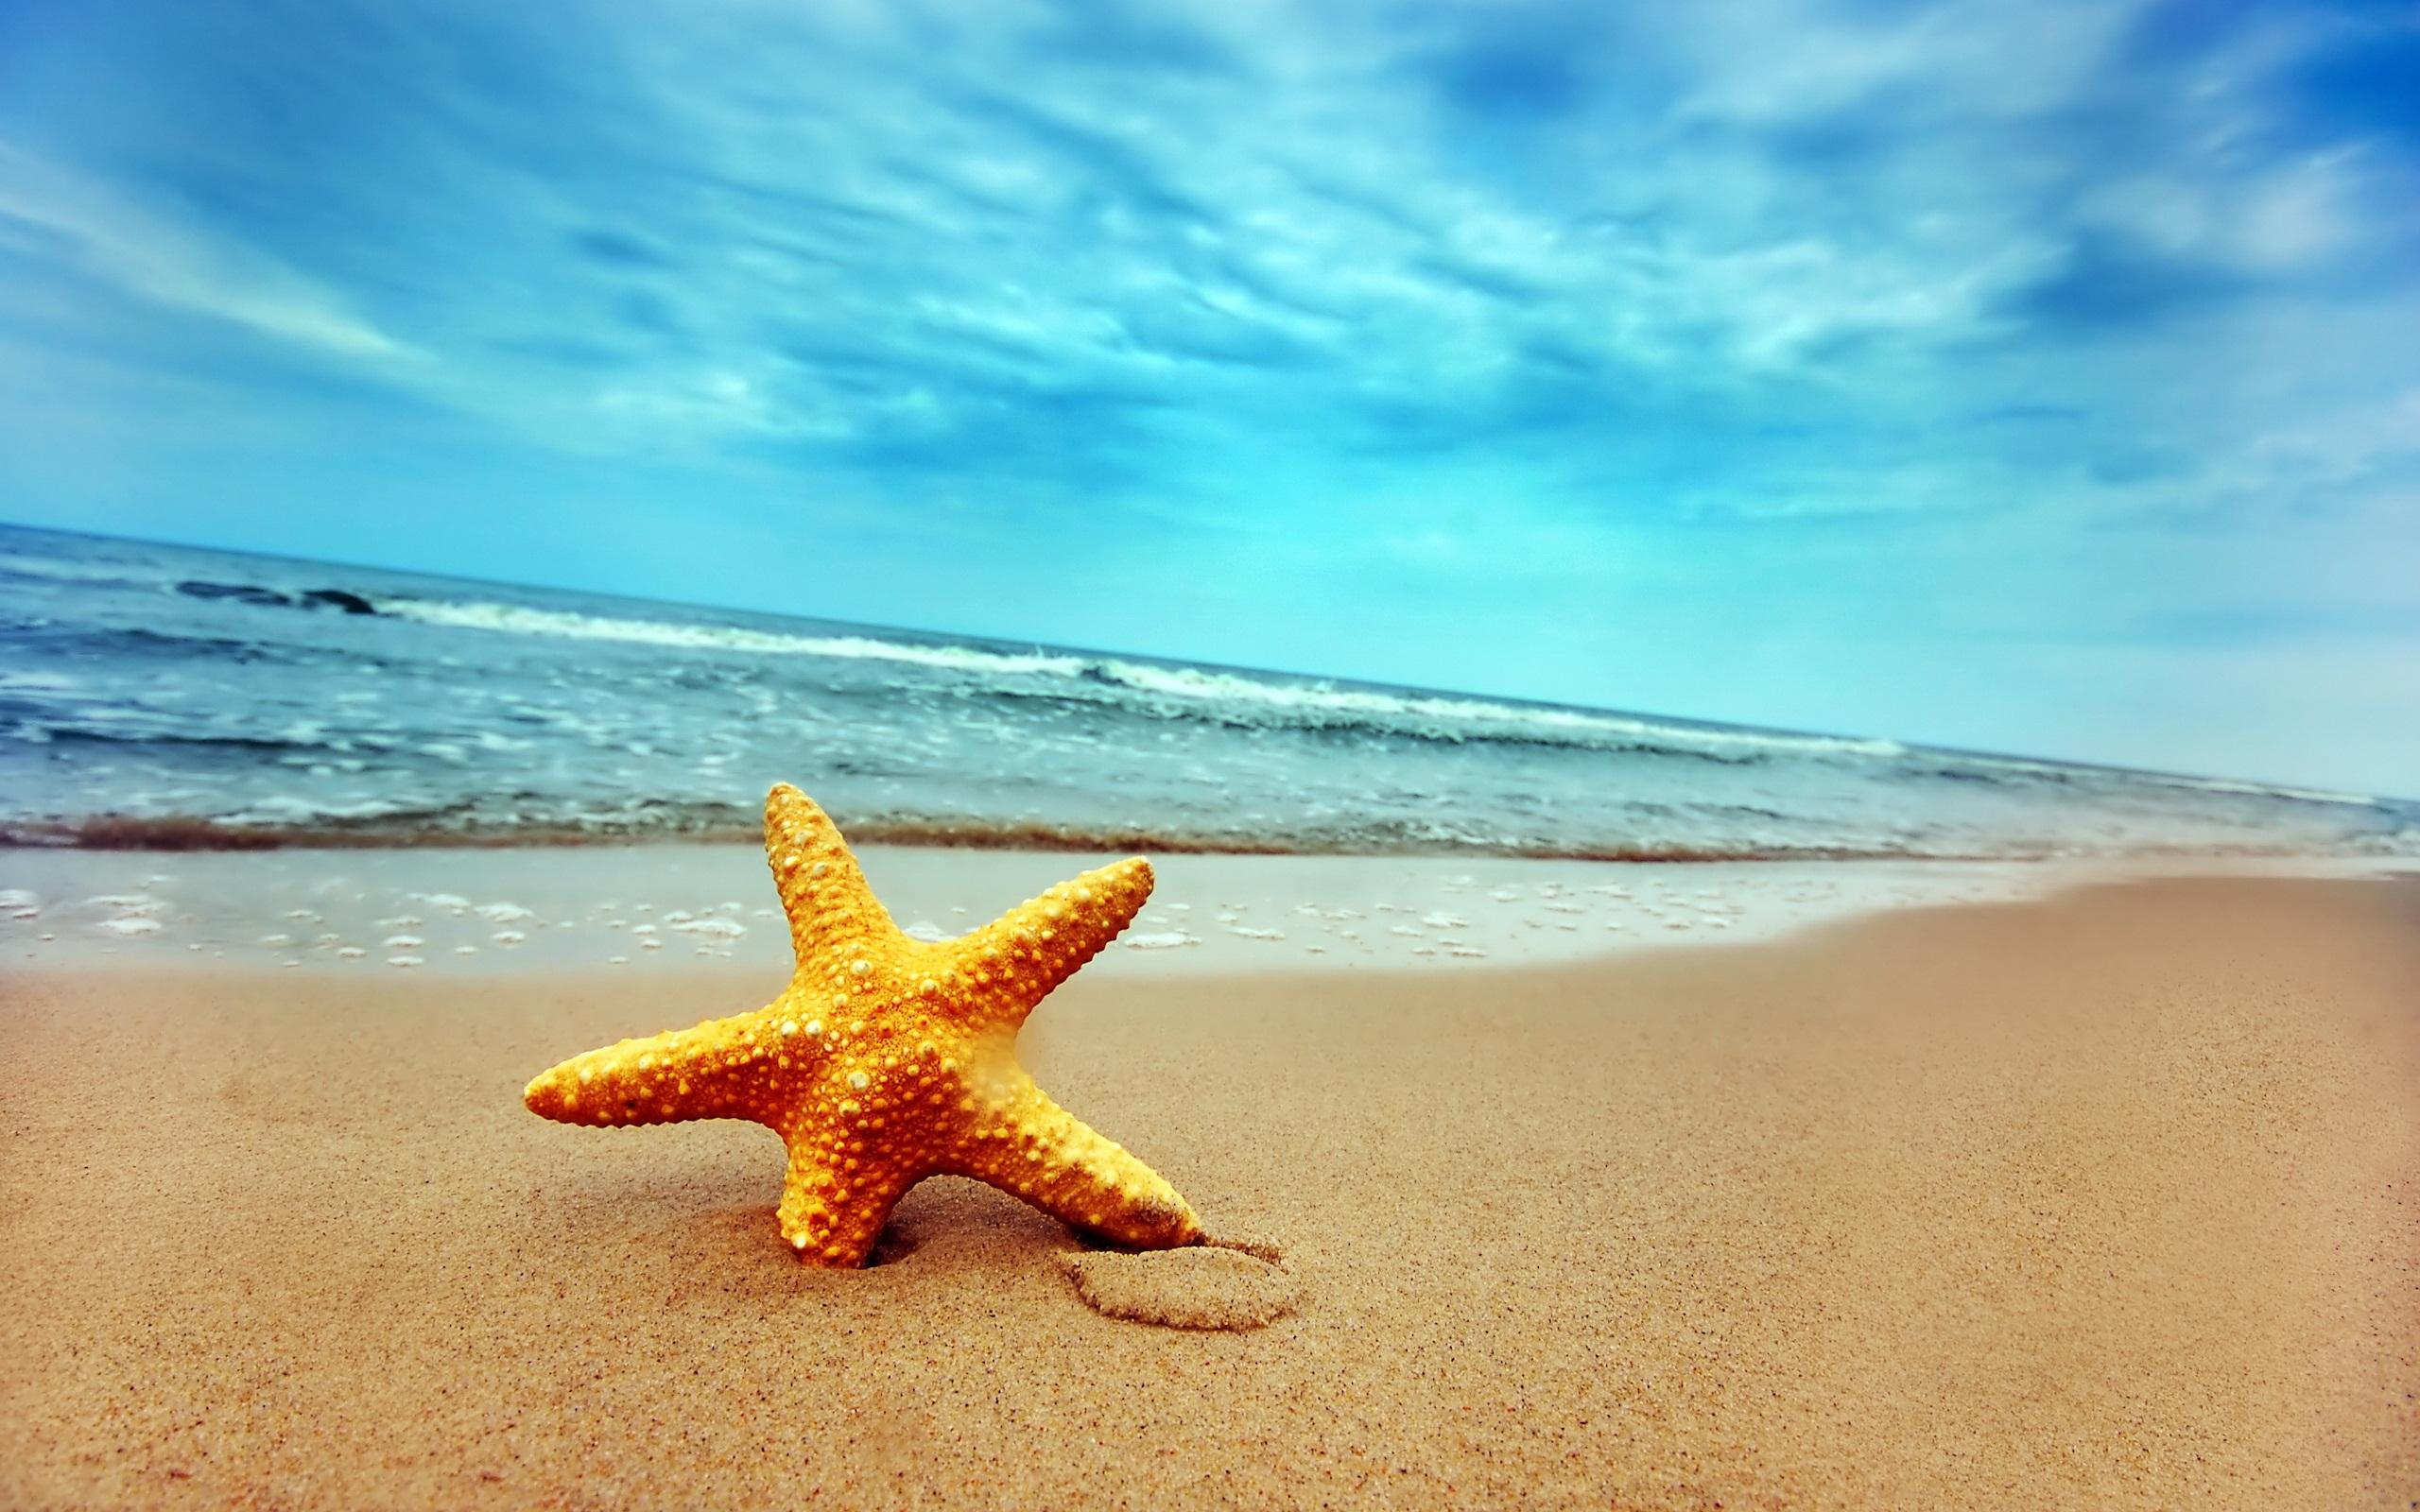 Beach Desktop Pictures S   Data-src /img/398631 - Beach High Resolution Starfish - HD Wallpaper